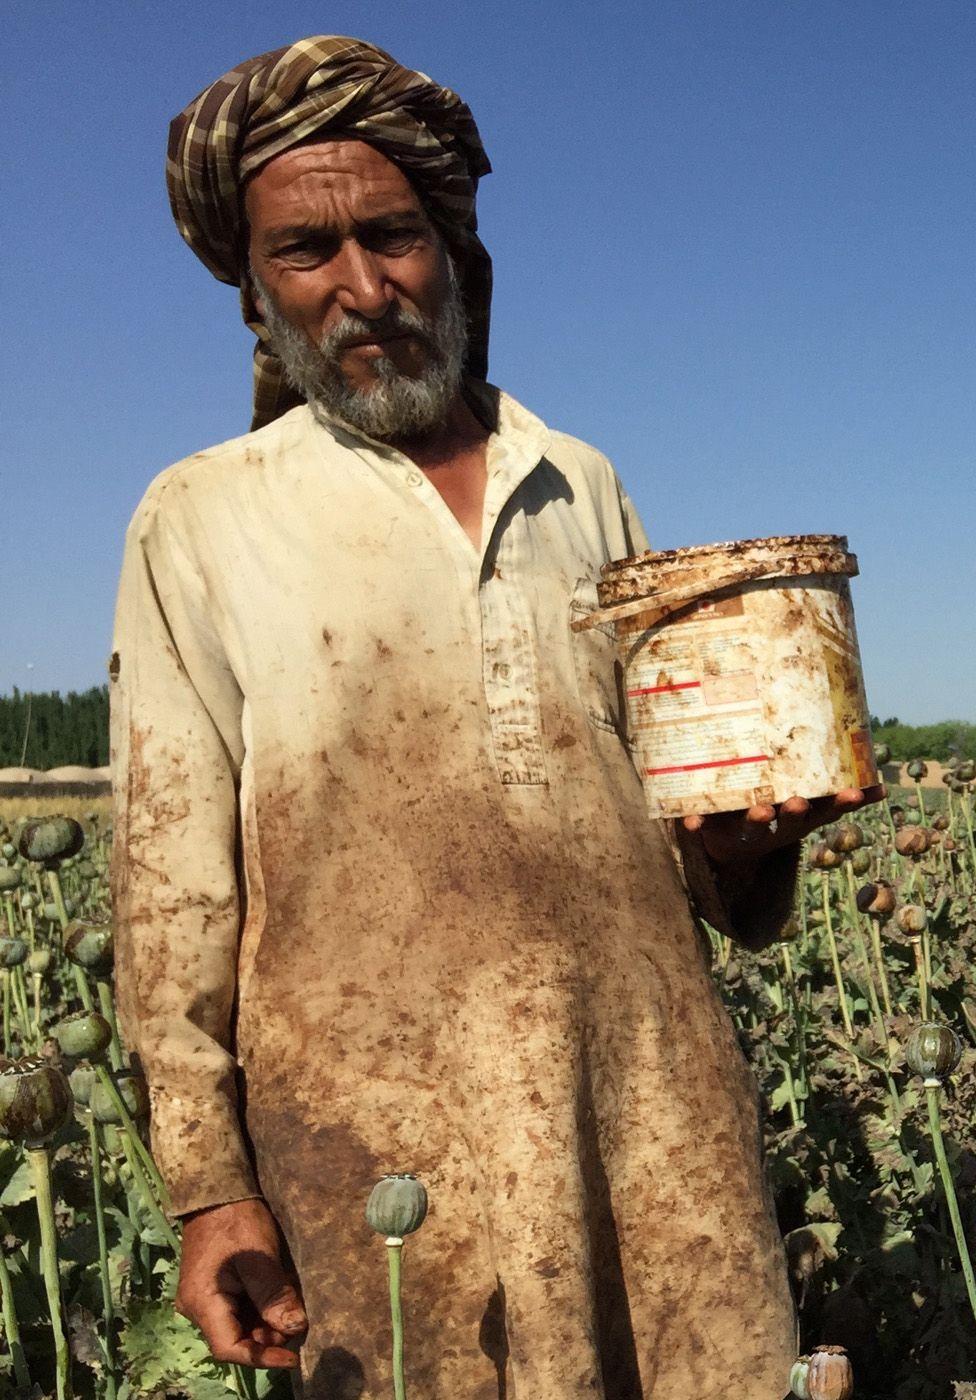 An opium farmer